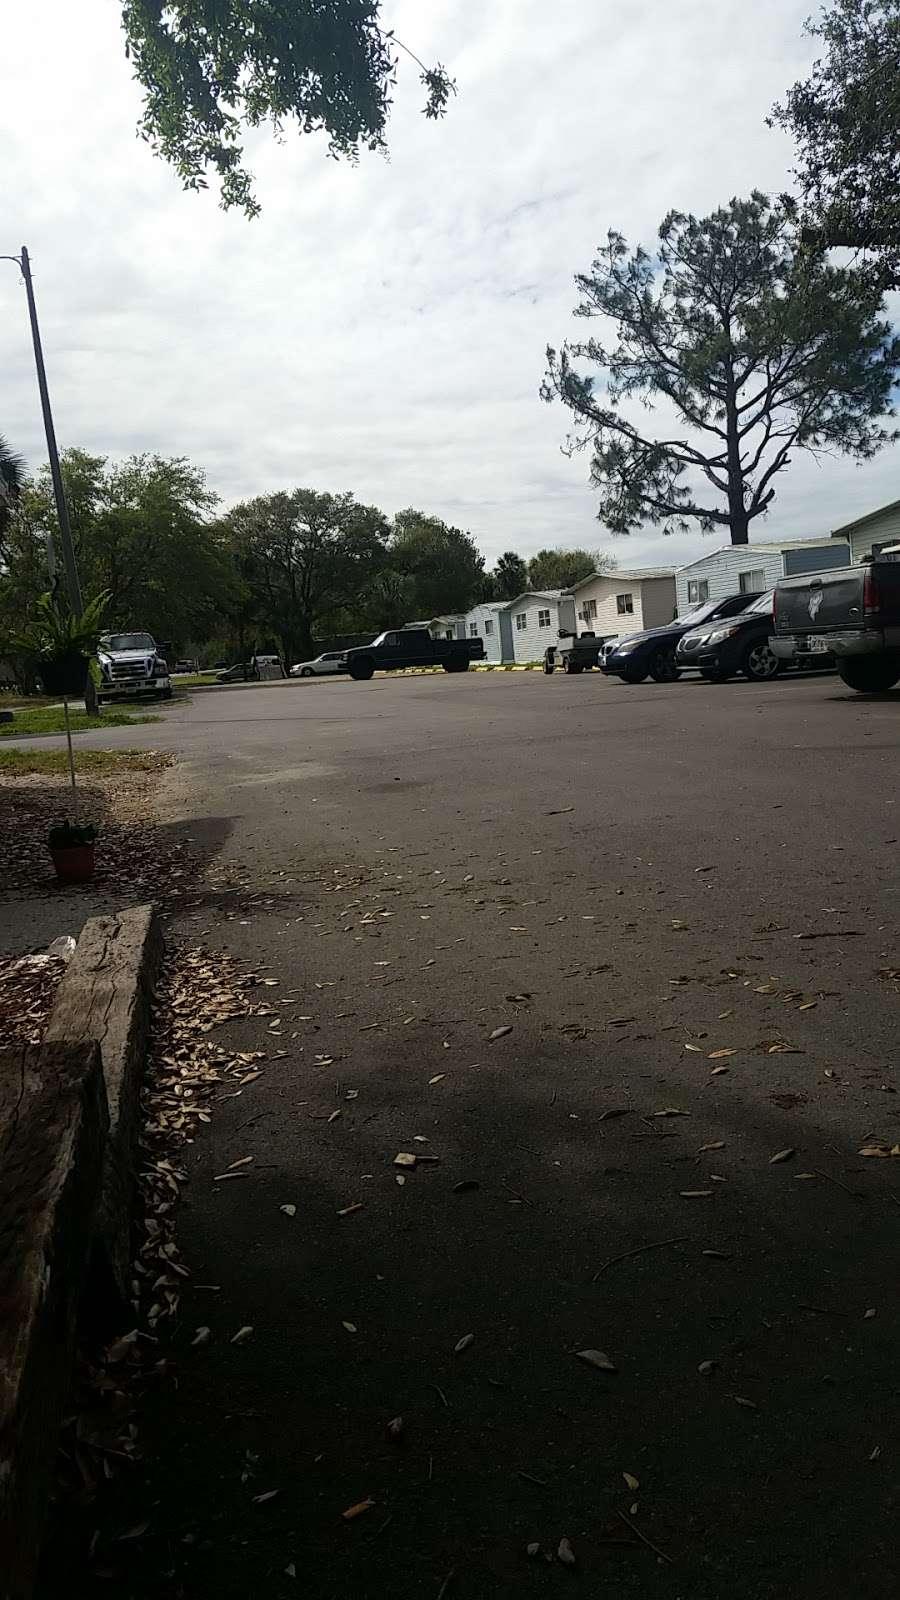 21 PALMS Travel Resort - lodging  | Photo 5 of 10 | Address: 584 State Road 559, Auburndale, FL 33823, USA